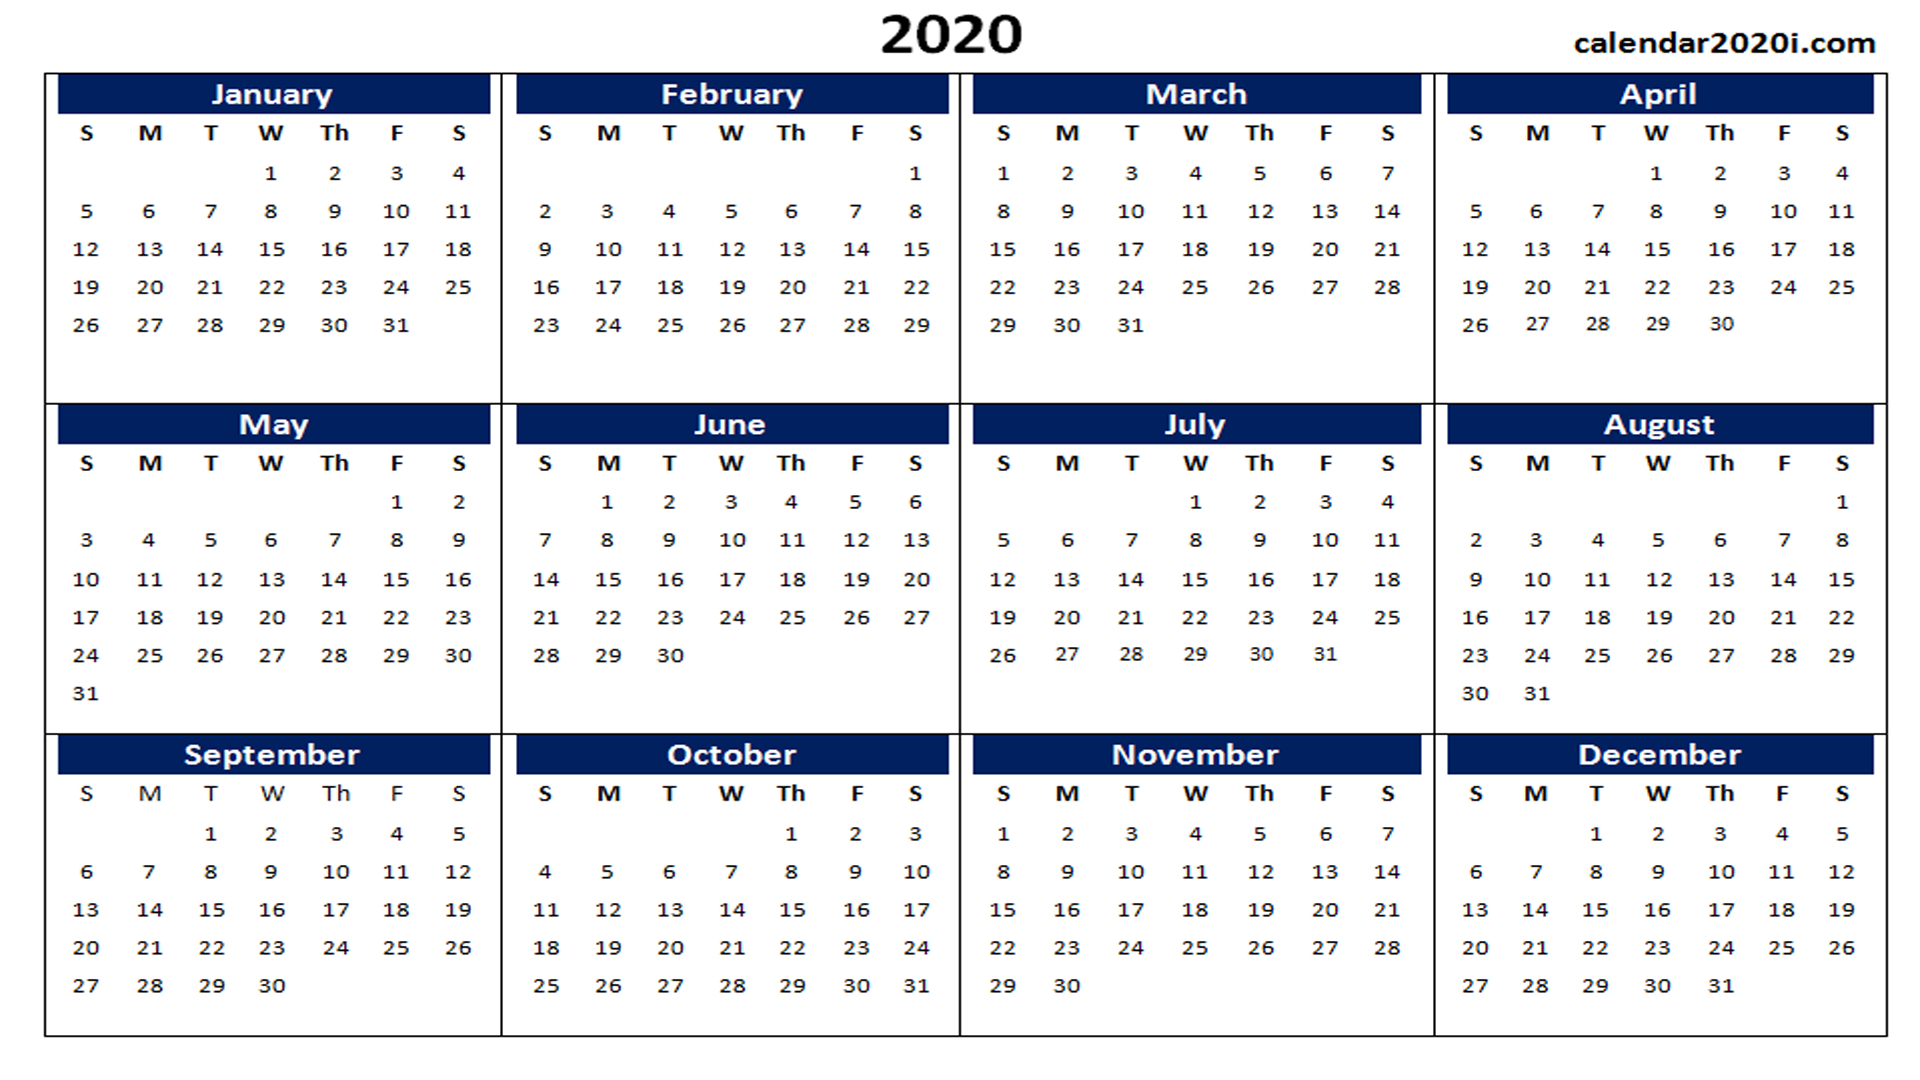 Microsoft Word Calendar Template 2020 - Wpa.wpart.co